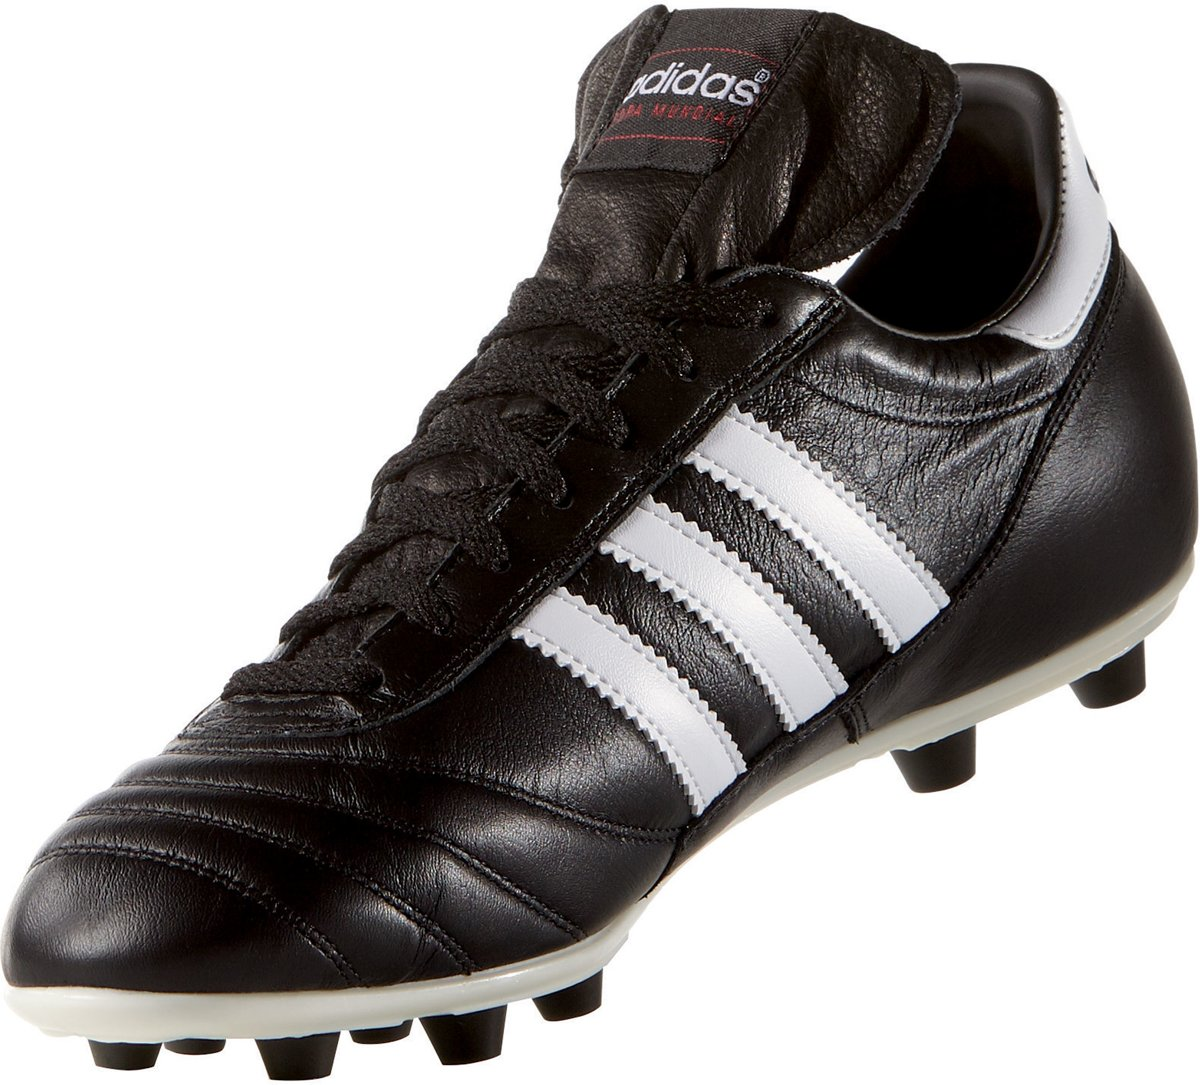 adidas voetbalschoenen breed